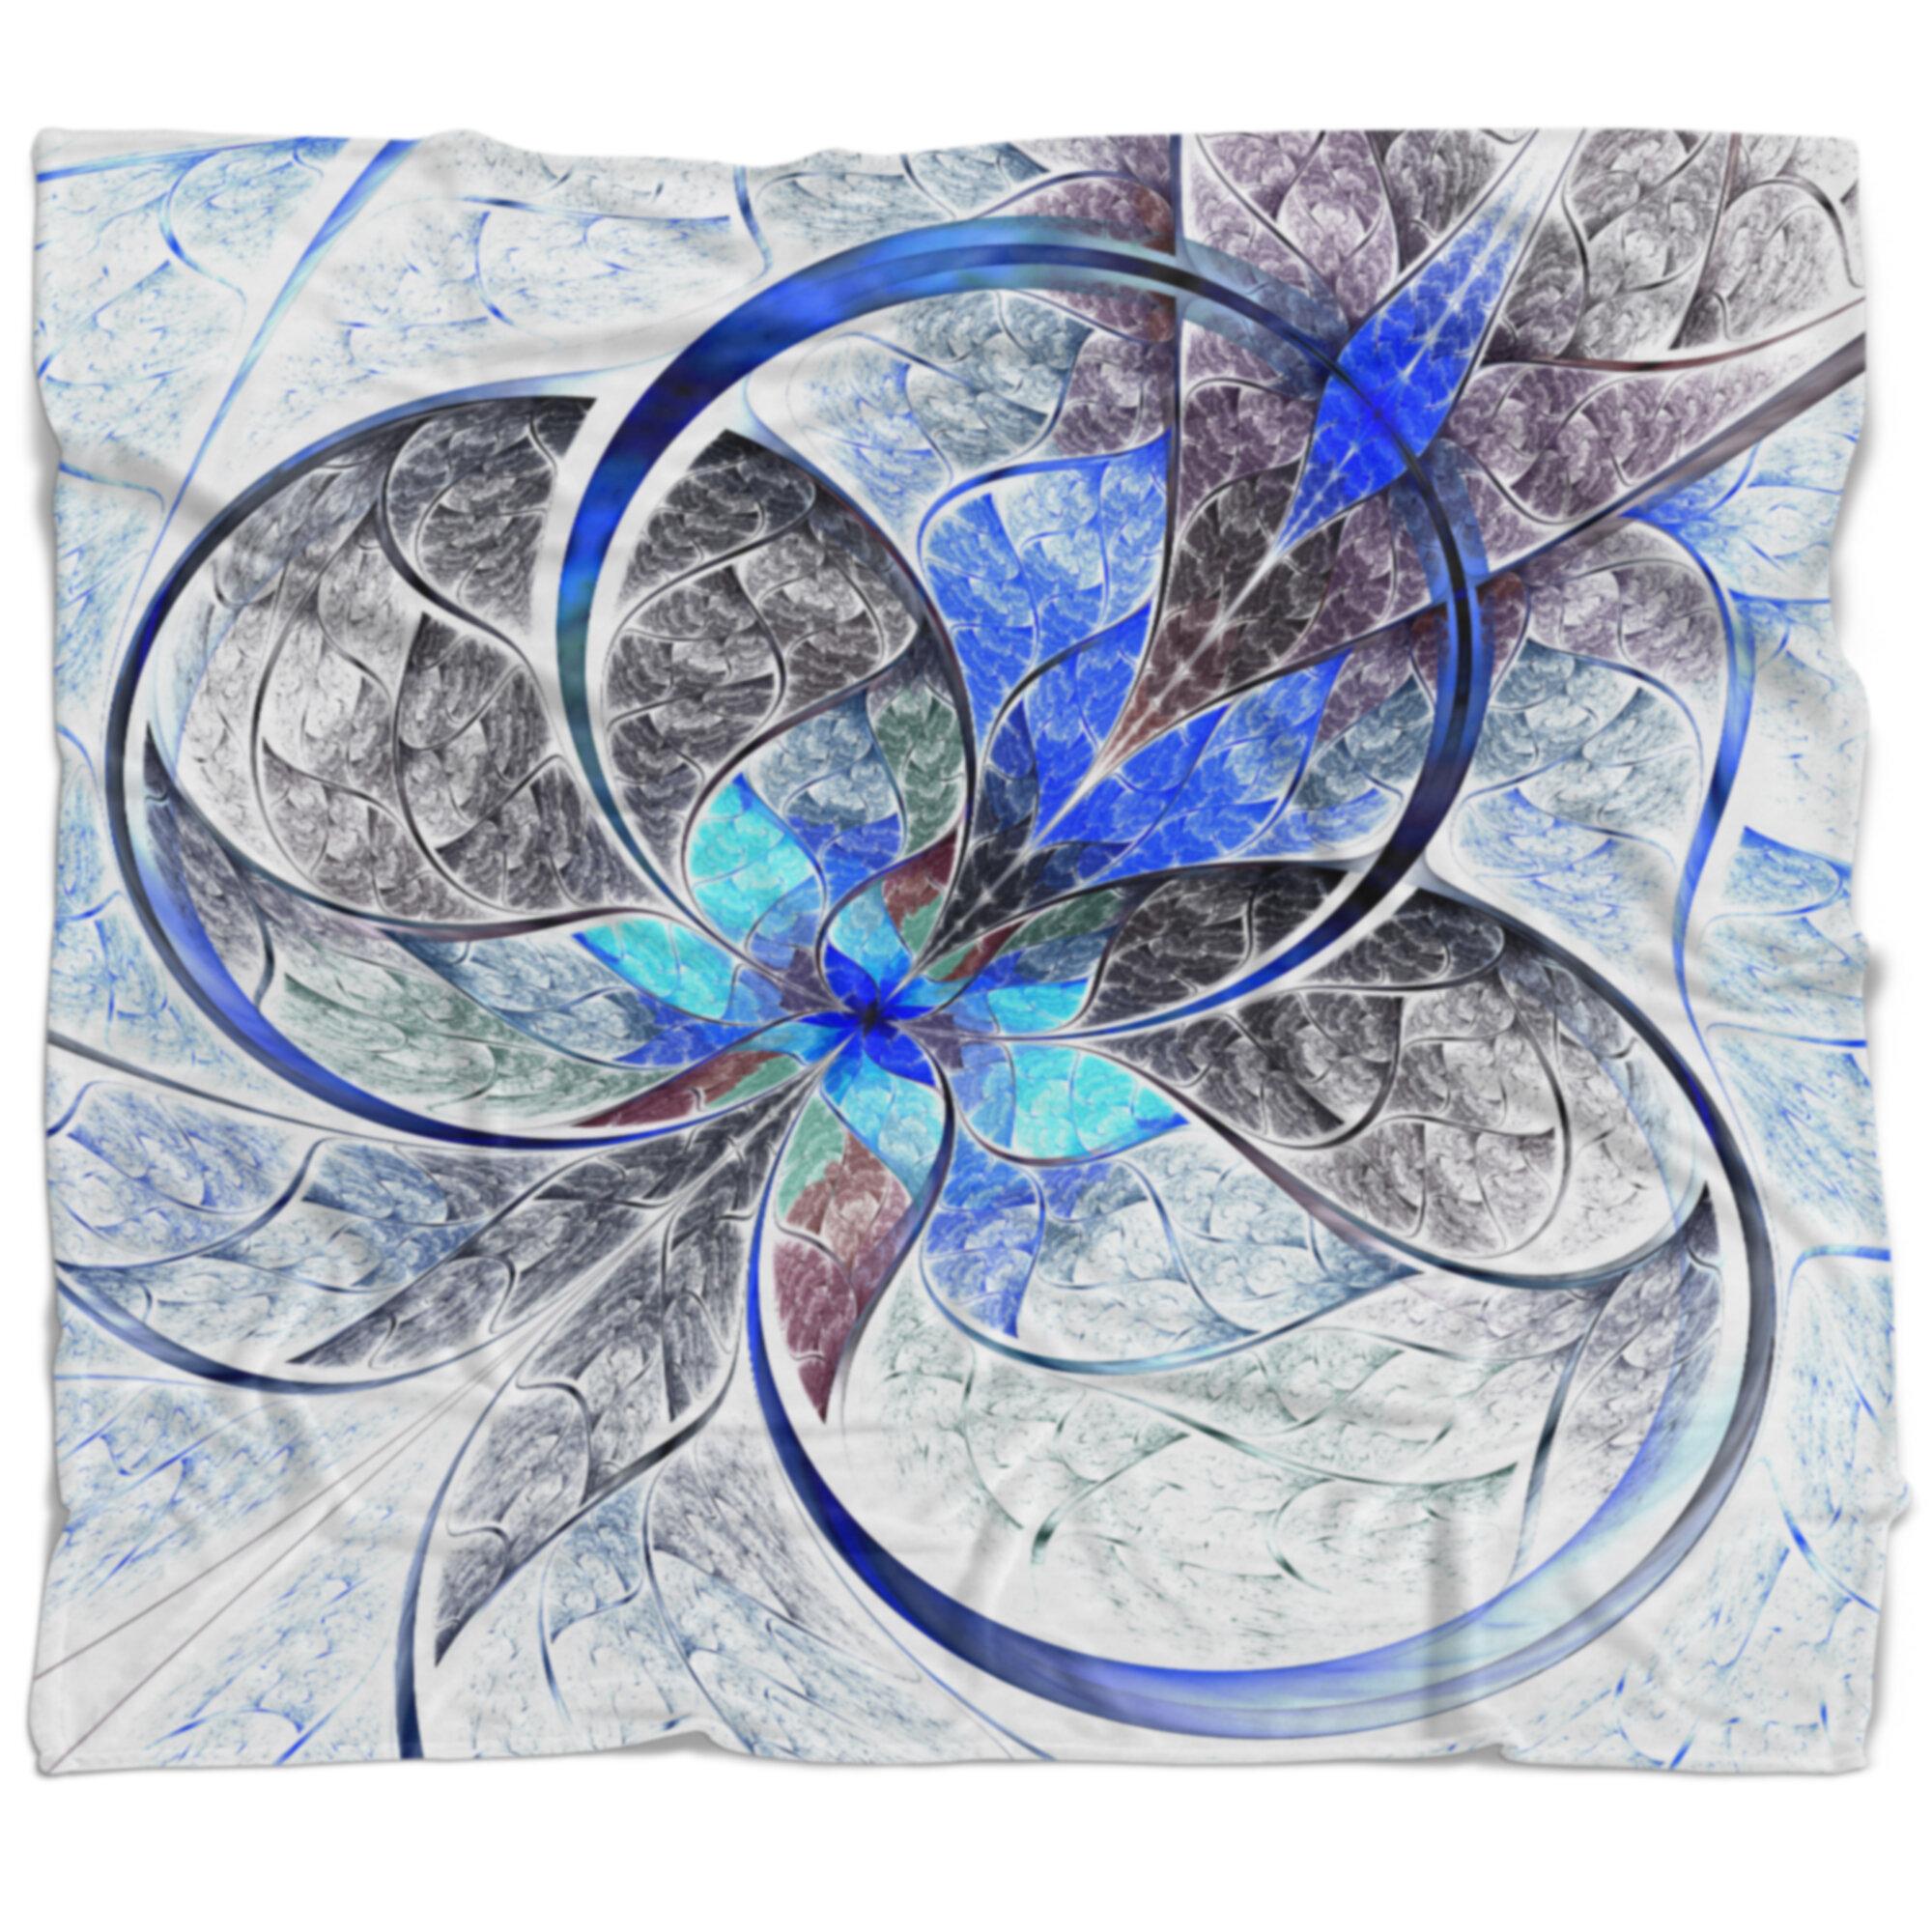 East Urban Home Abstract Symmetrical Fractal Flower Blanket Wayfair